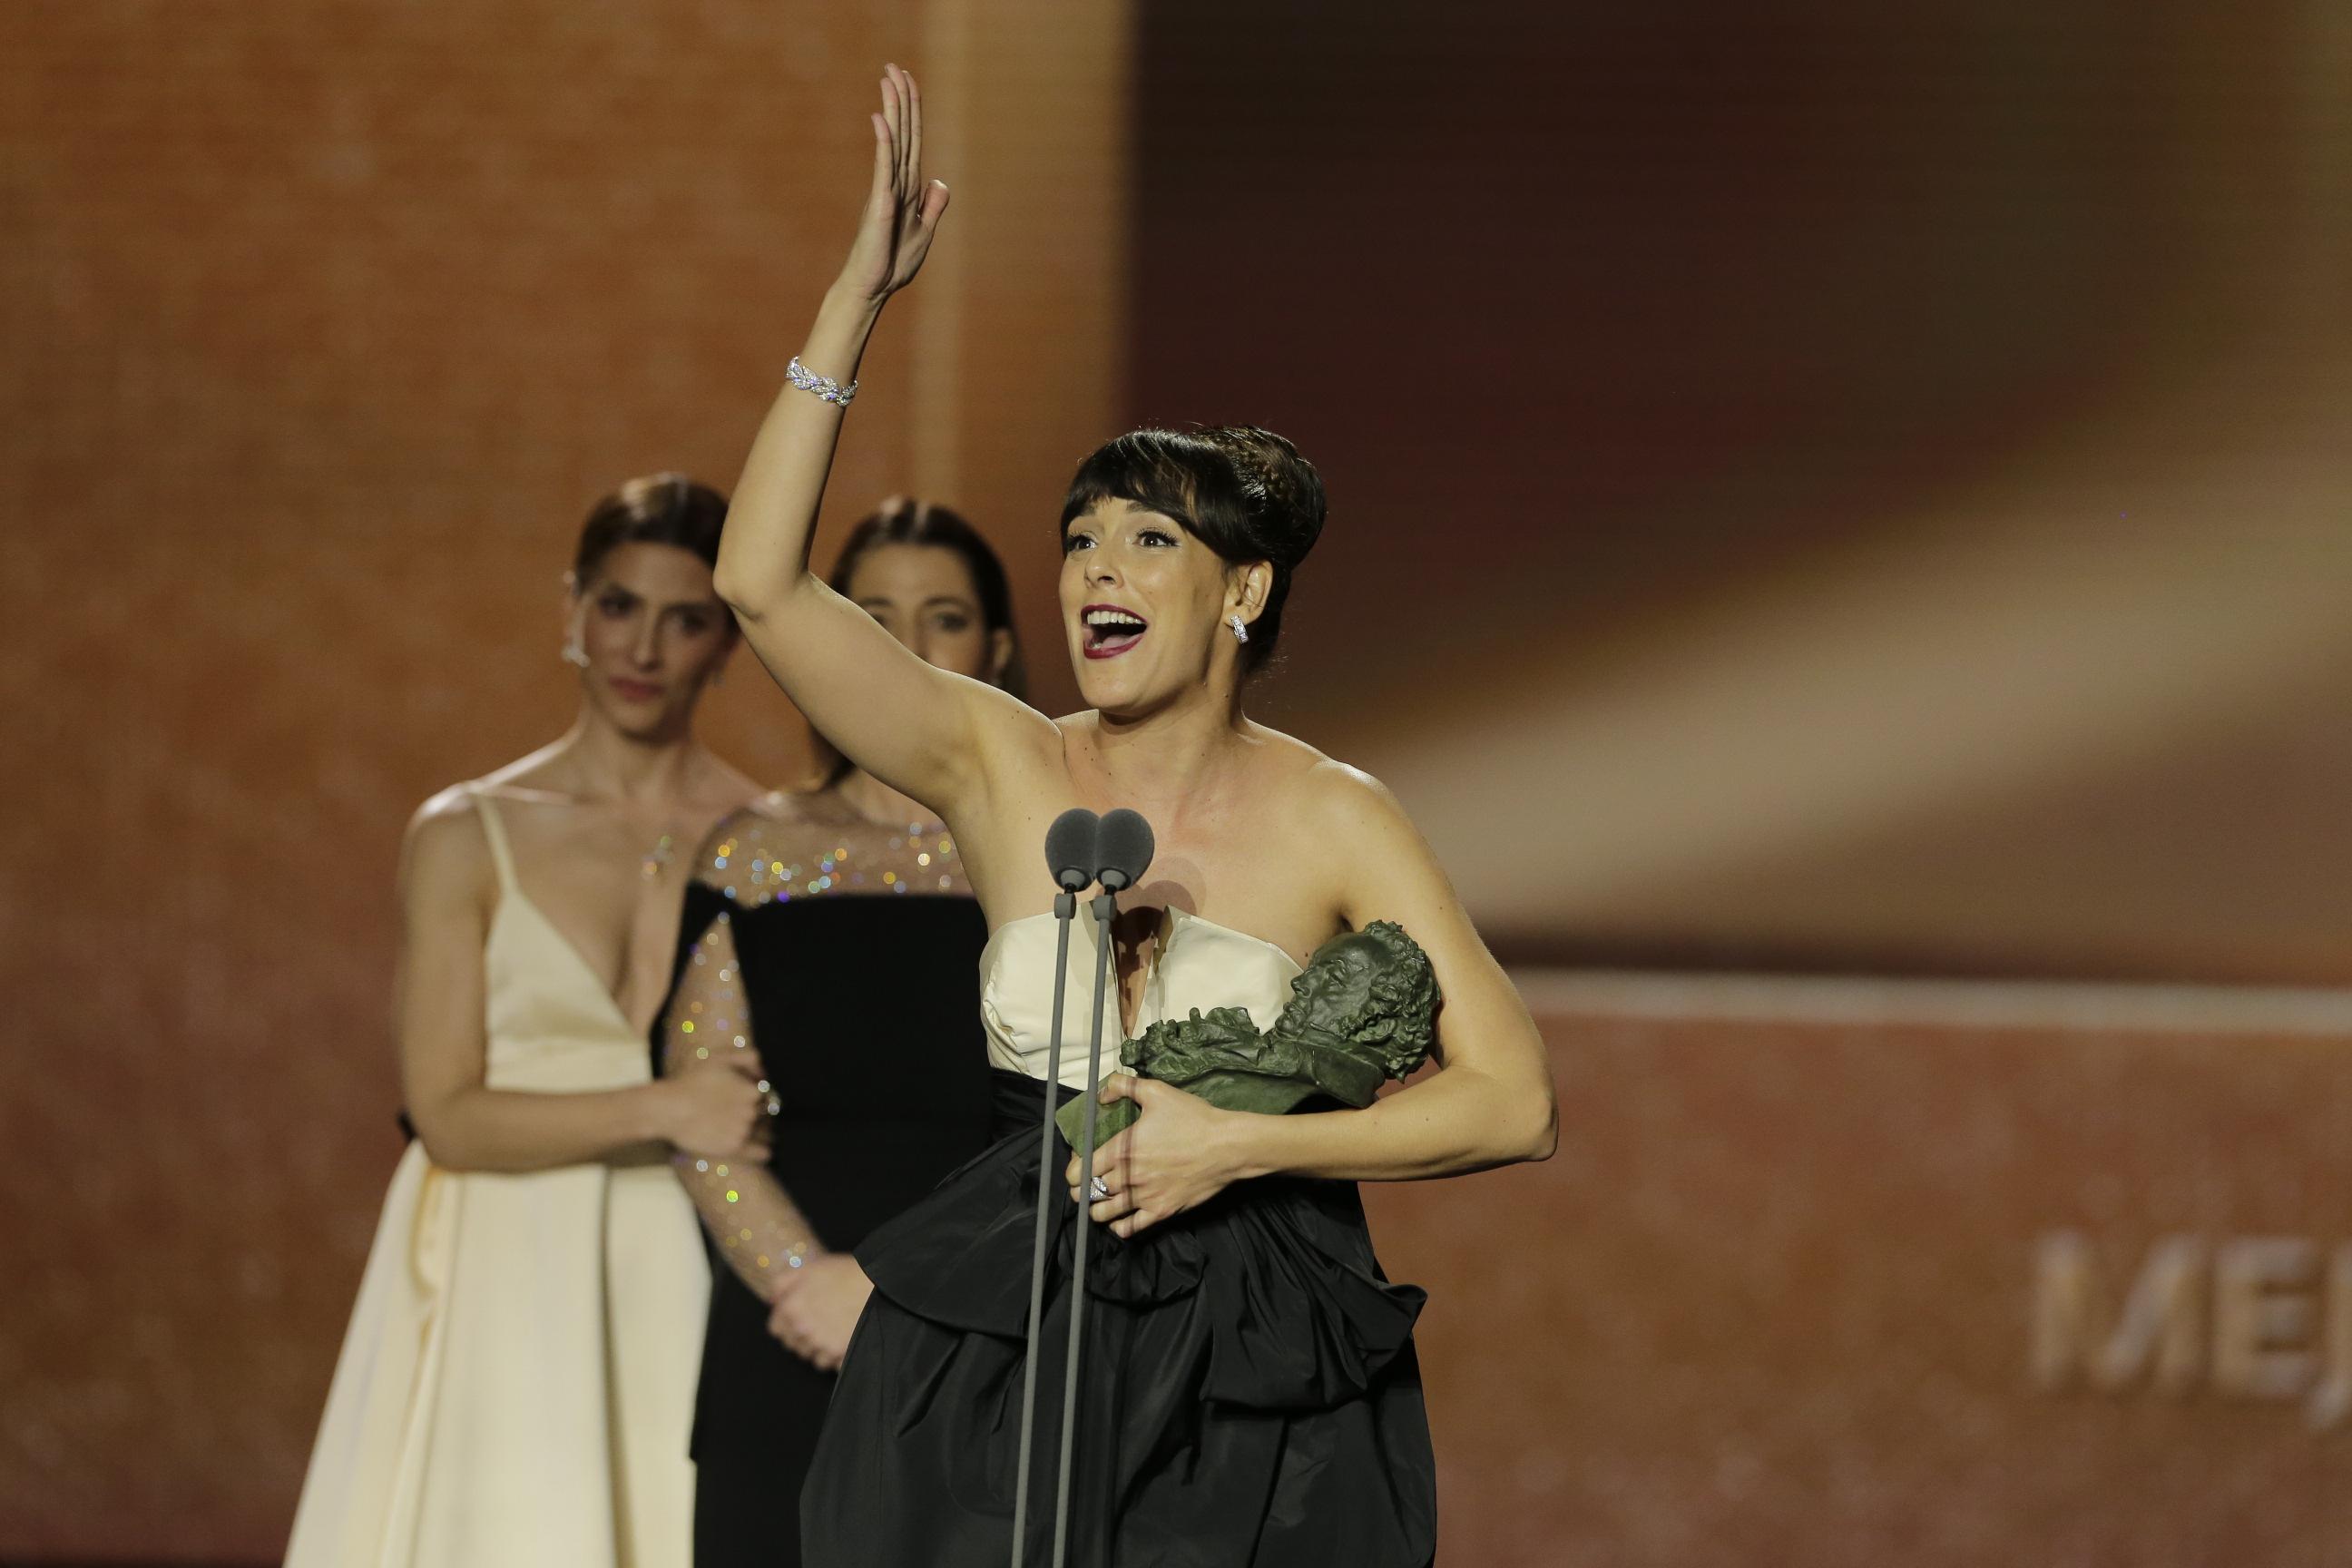 L2F Feb 20 pic Spain Goya Awards Belén Cuesta